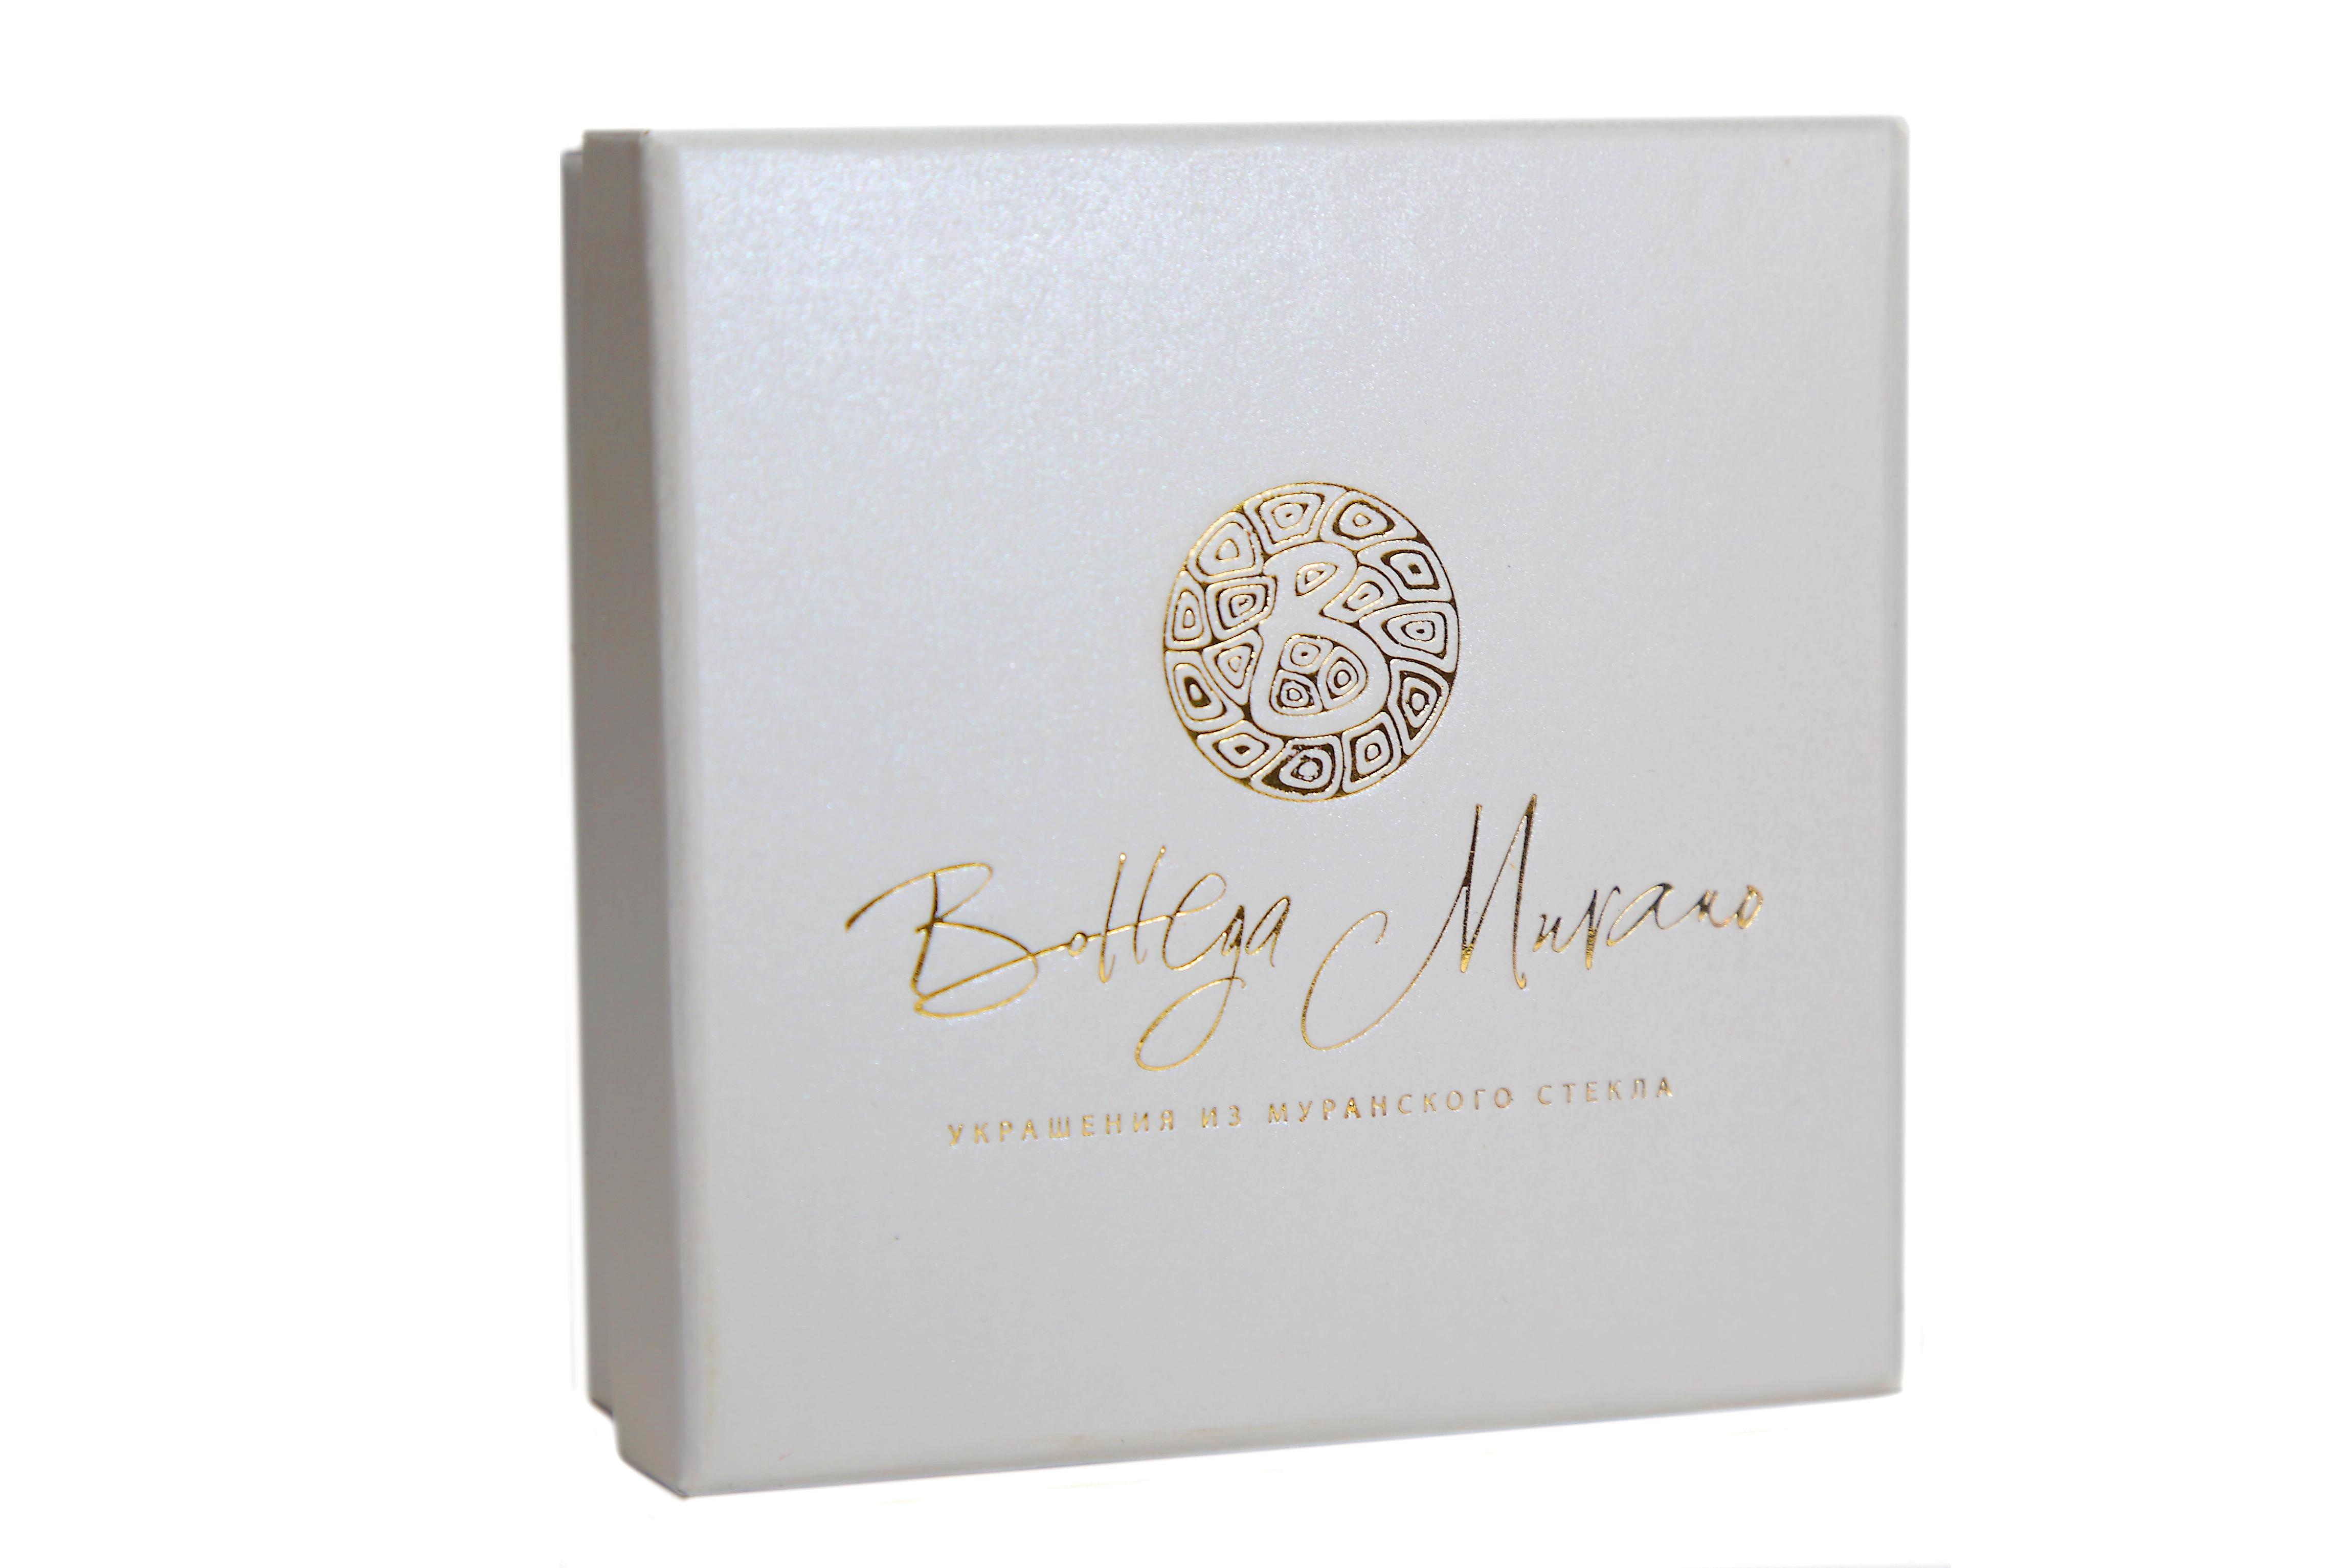 Комплект бижутерии Bottega Murano (4788)